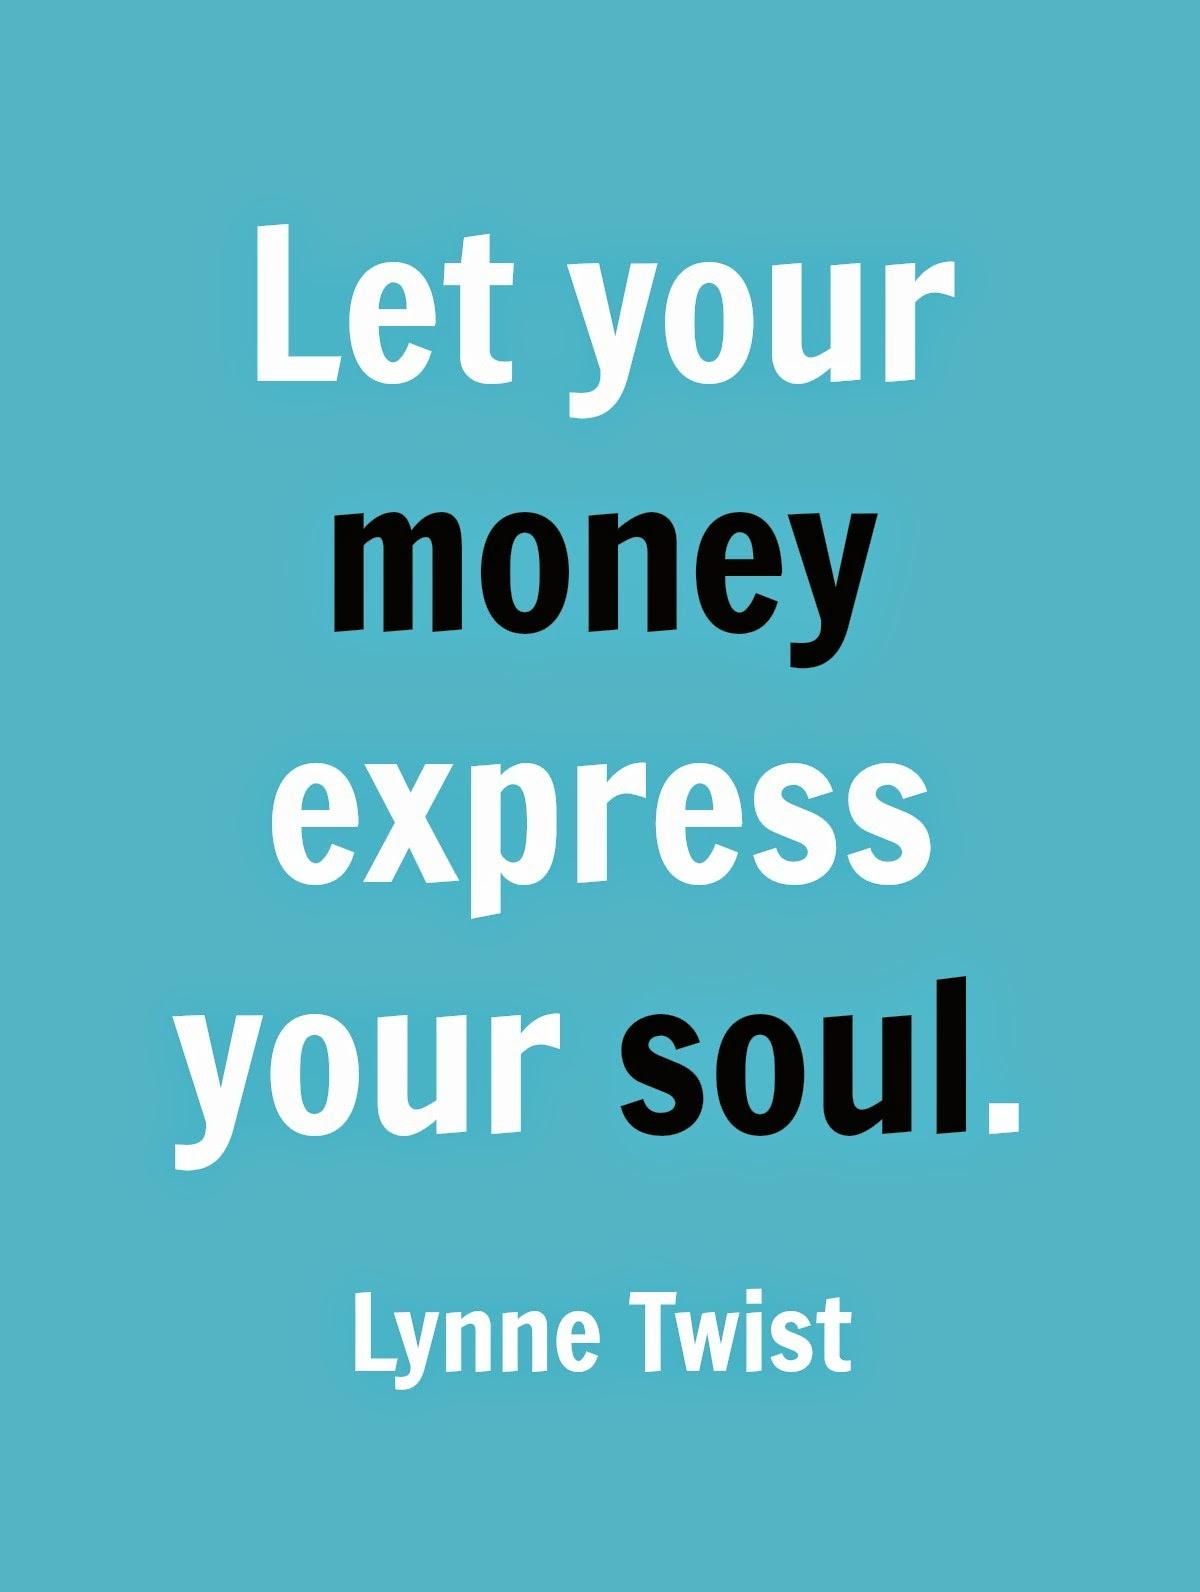 Soul Money Lynne Twist quote